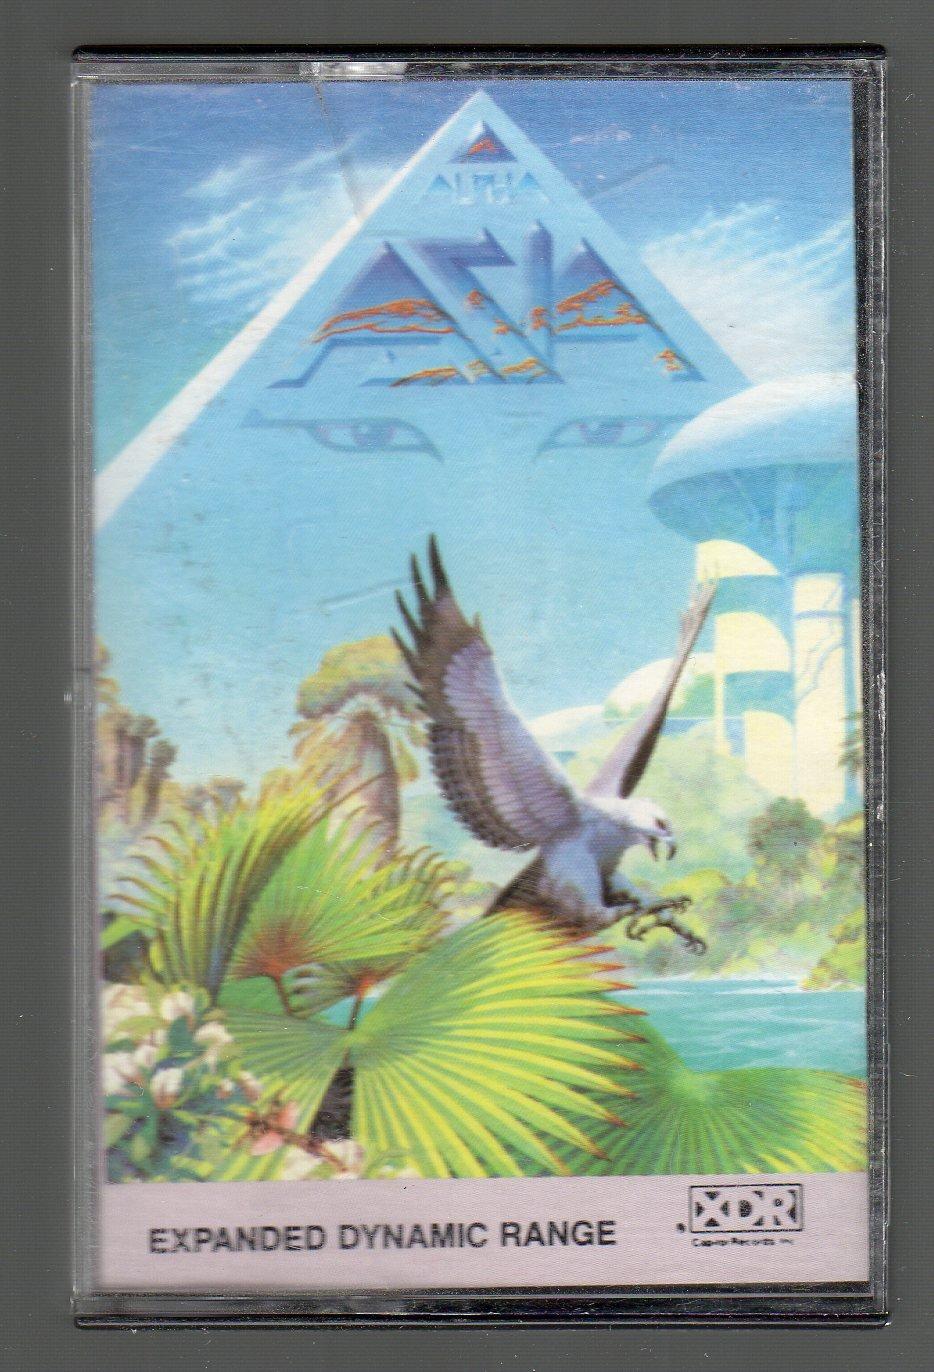 Asia - Alpha Cassette Tape